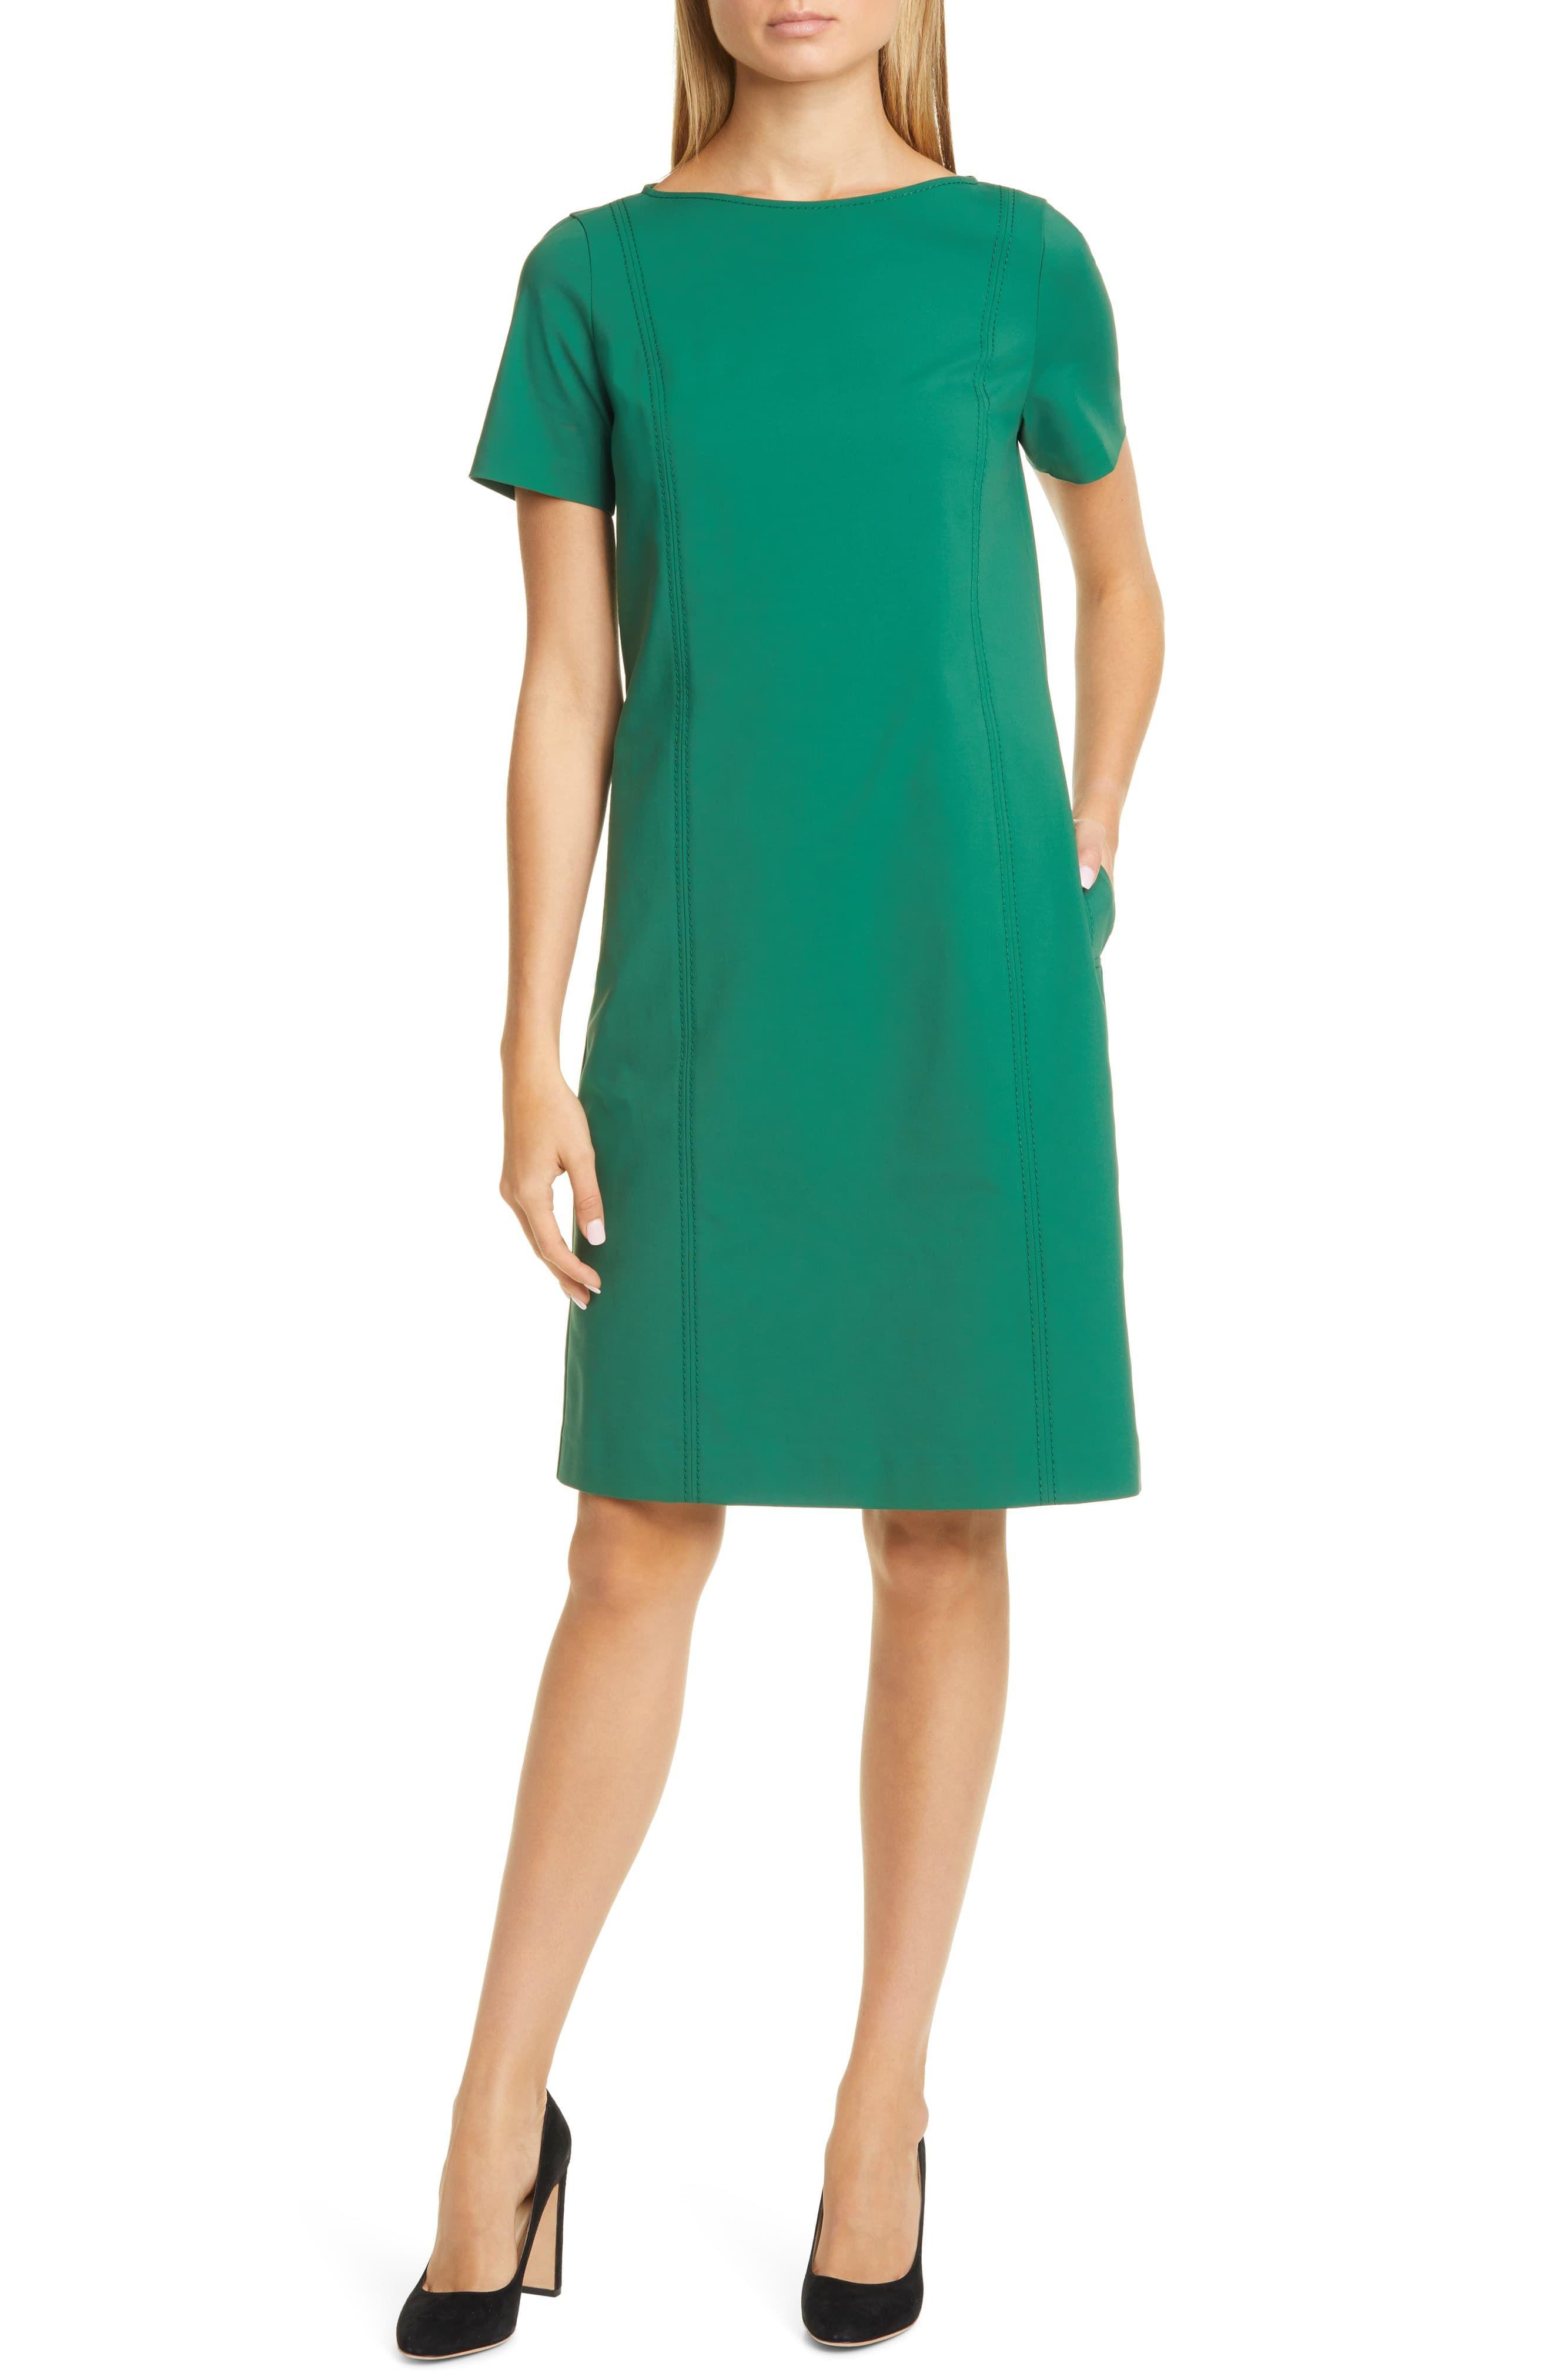 Lafayette 148 New York Easton Shift Dress Nordstrom Short Sleeve Shift Dress Shift Dress Fashion Clothes Women [ 4048 x 2640 Pixel ]